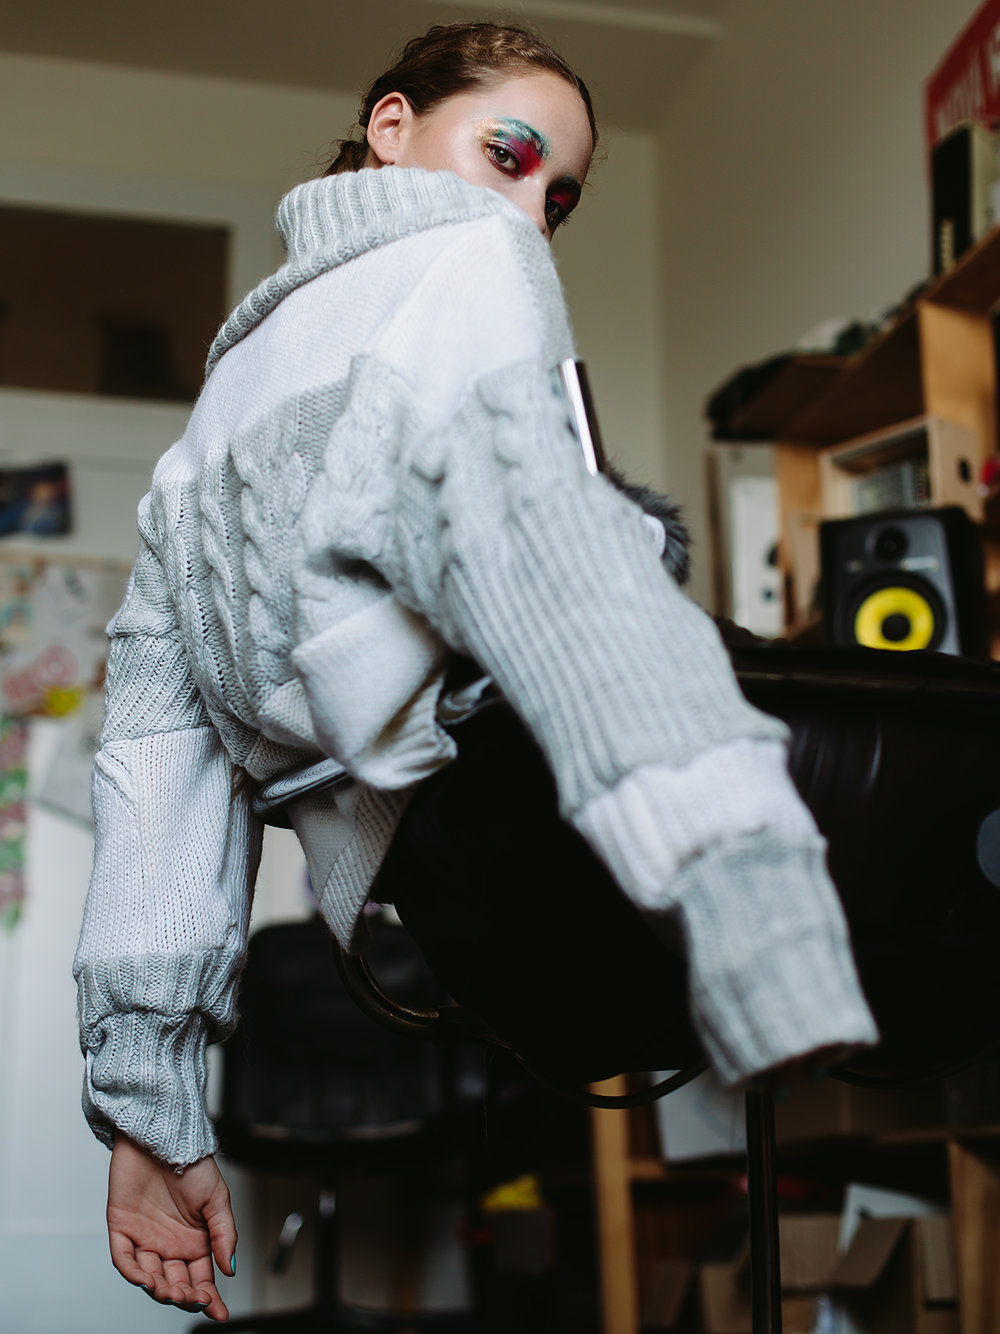 Alexander Bel_Andrea Lojkaskova_Can Robots See Dreams_Analog_23.jpg